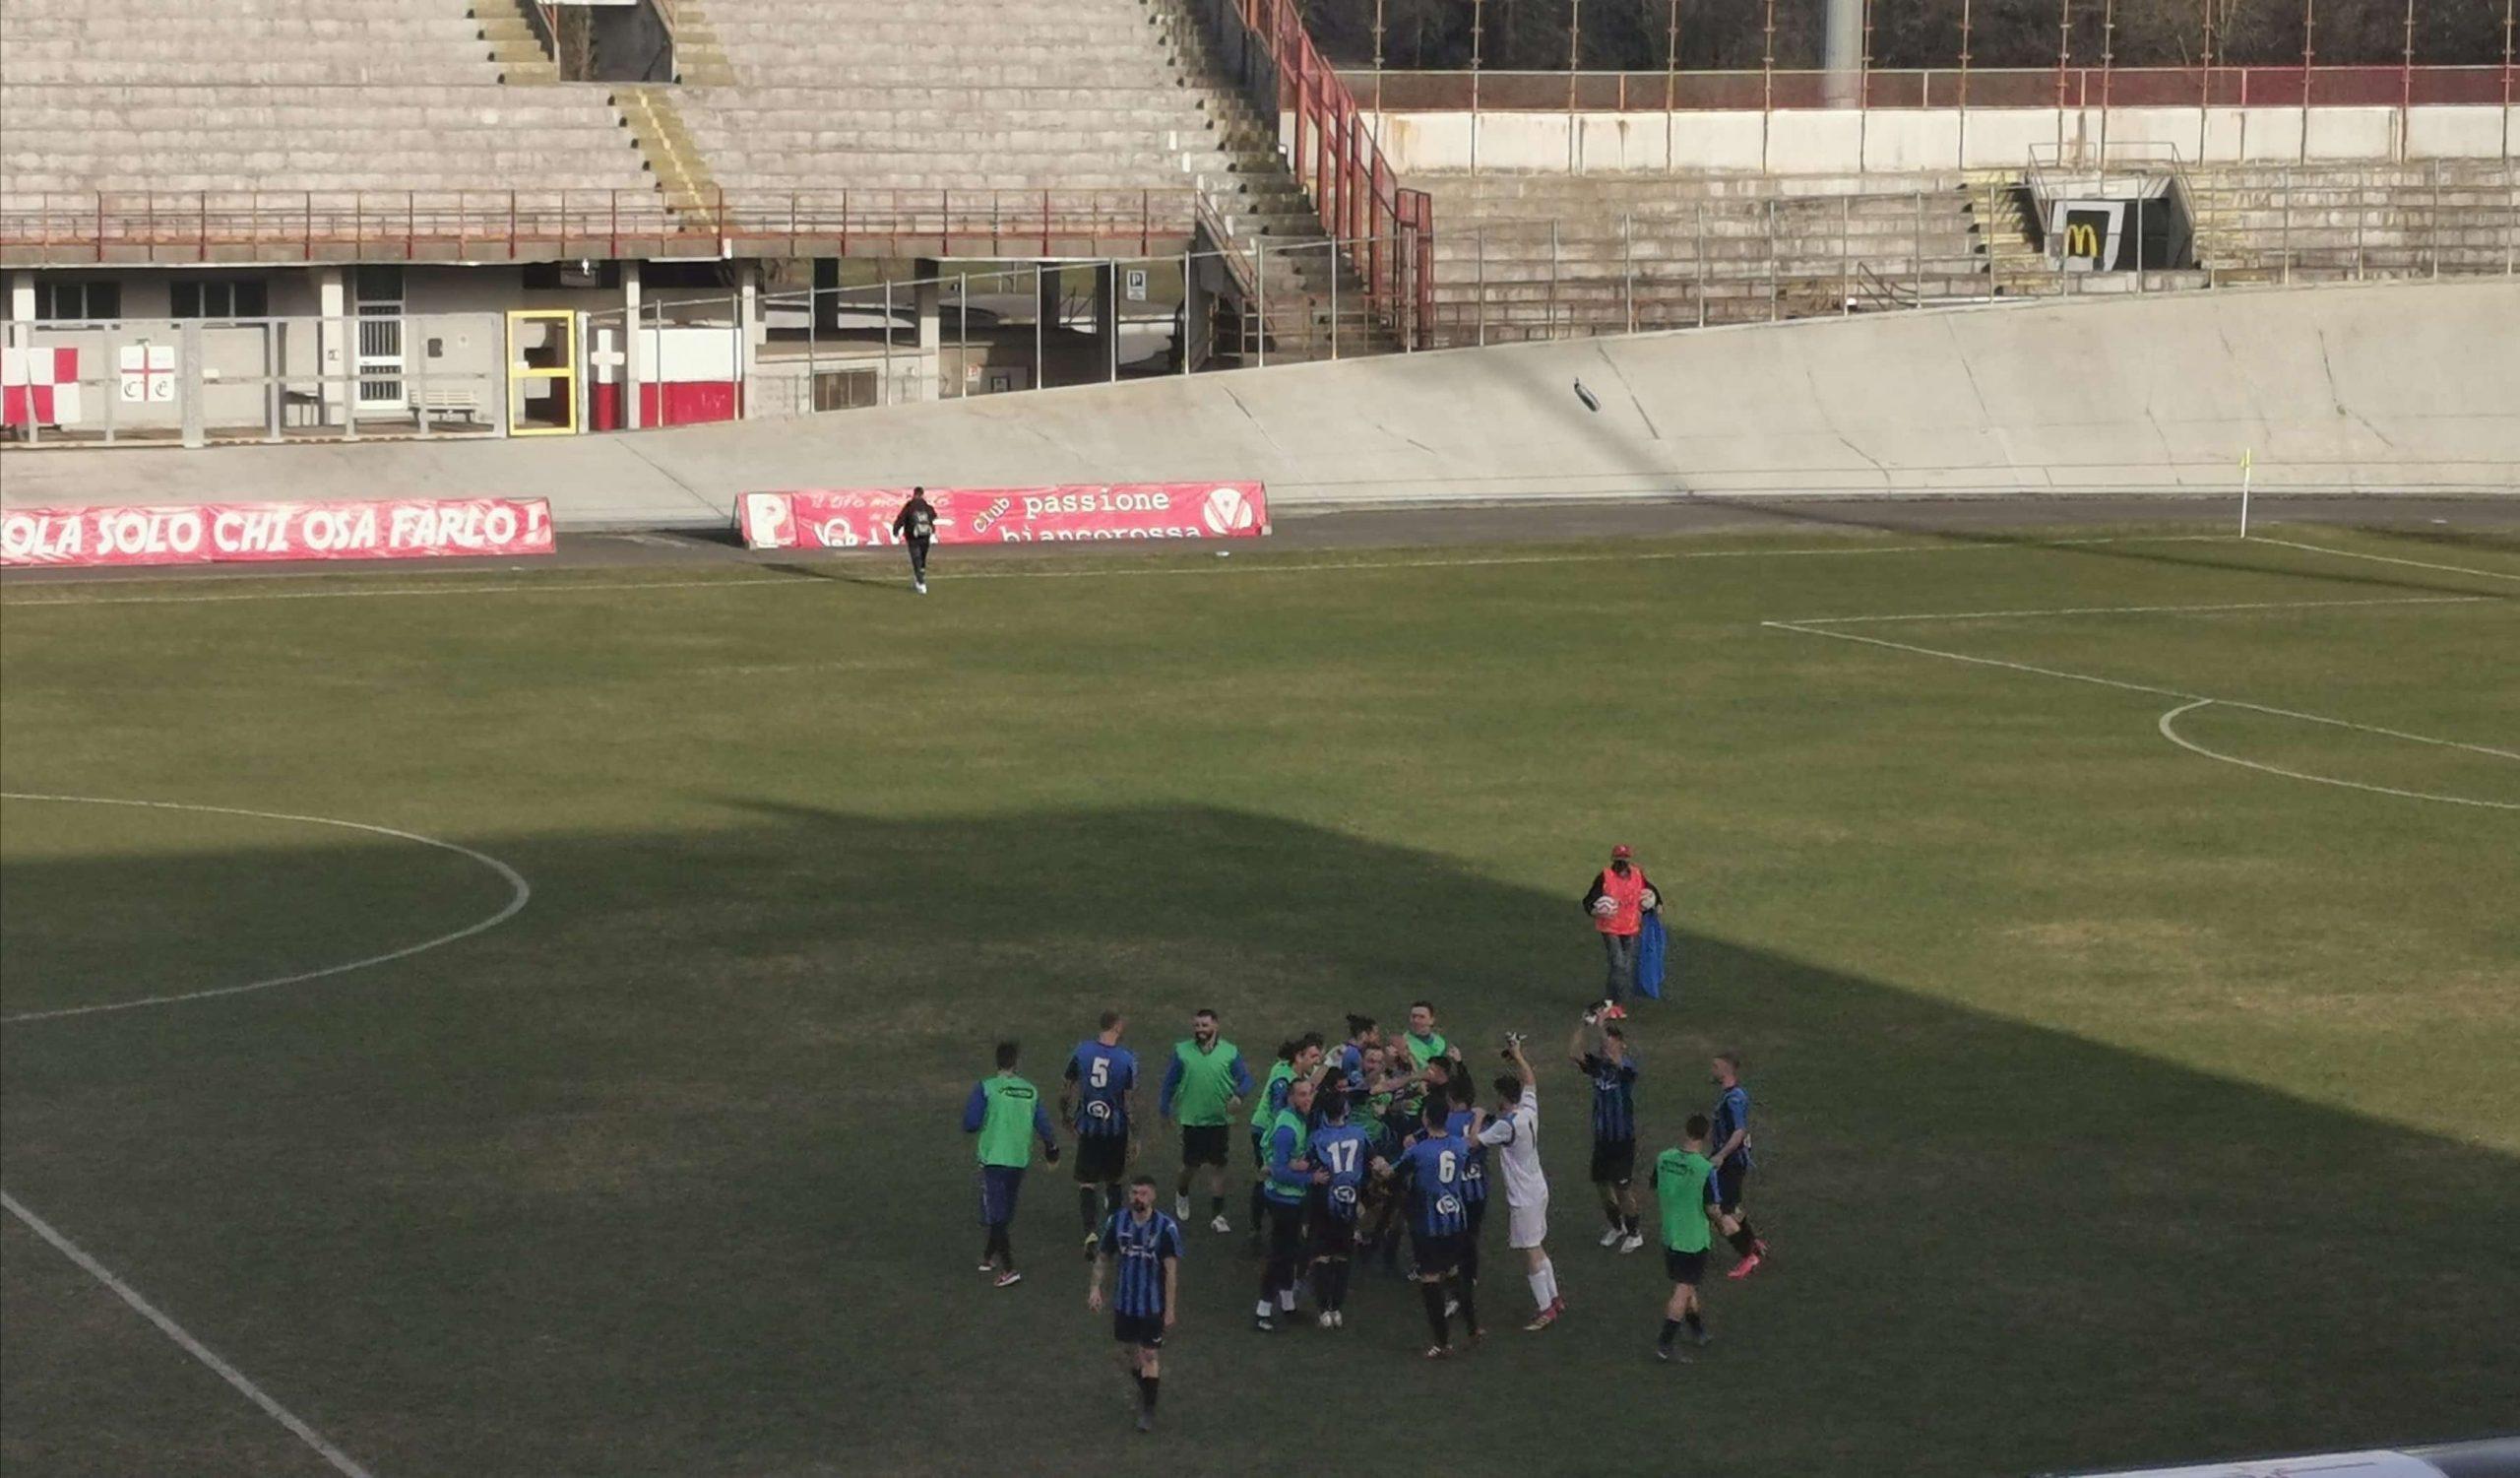 L'IMPERIA FIRMA UN'ALTRA IMPRESA: ESPUGNATO L' 'OSSOLA' PER 1-0